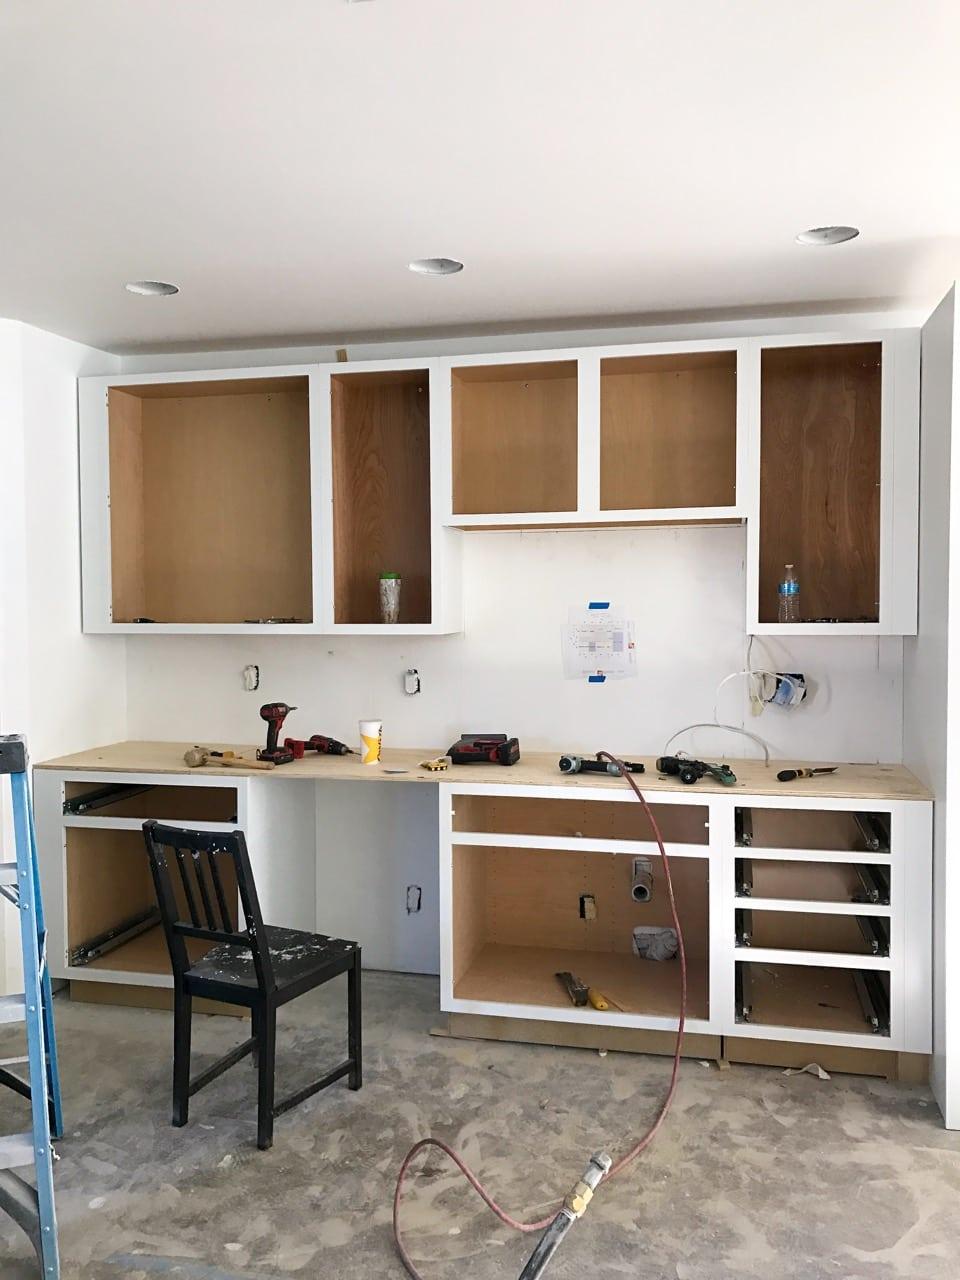 Installation of new kitchen cabinets